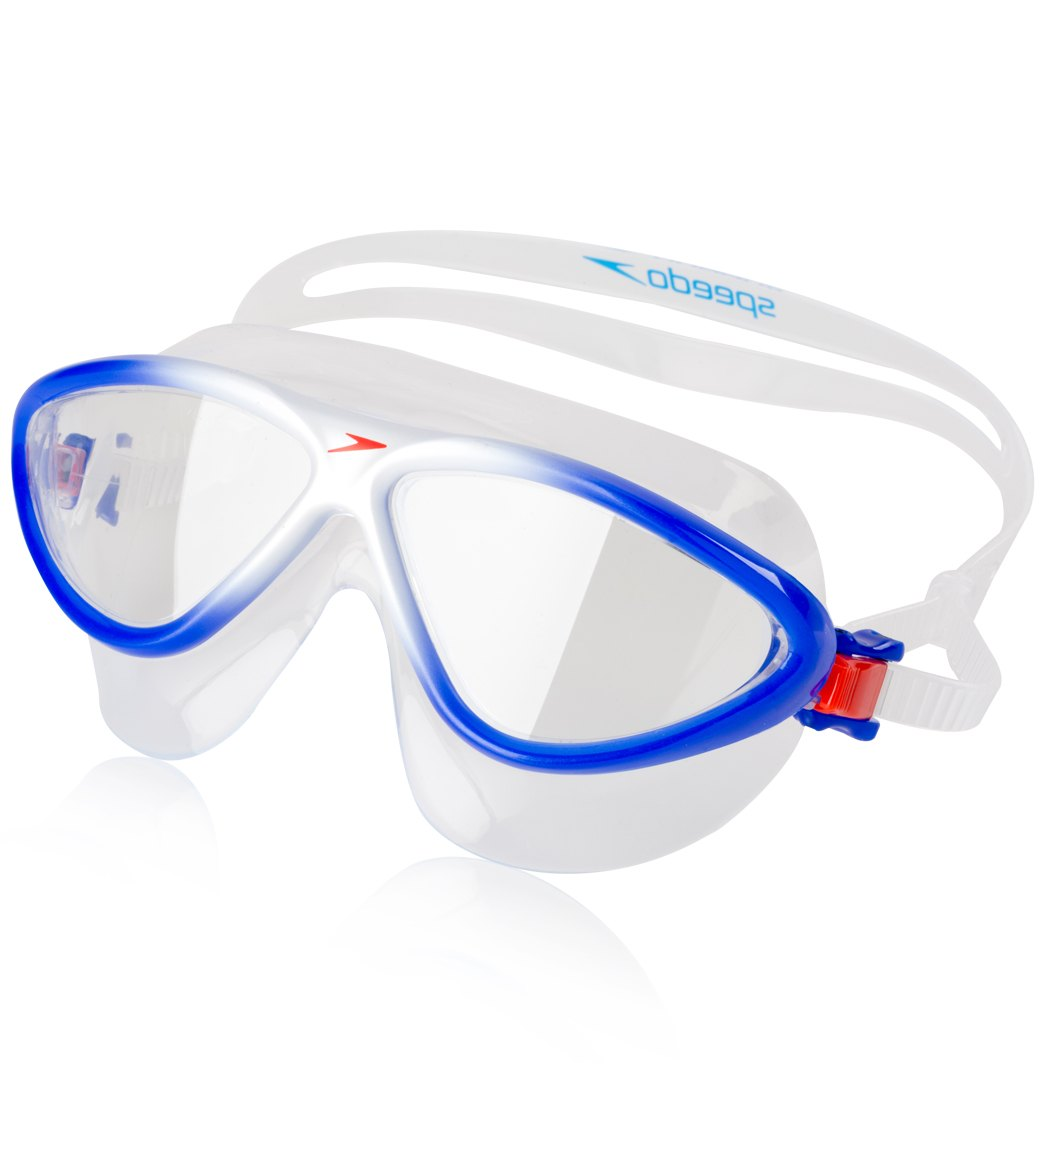 Speedo Occulus Prime Goggle At Swimoutlet Com